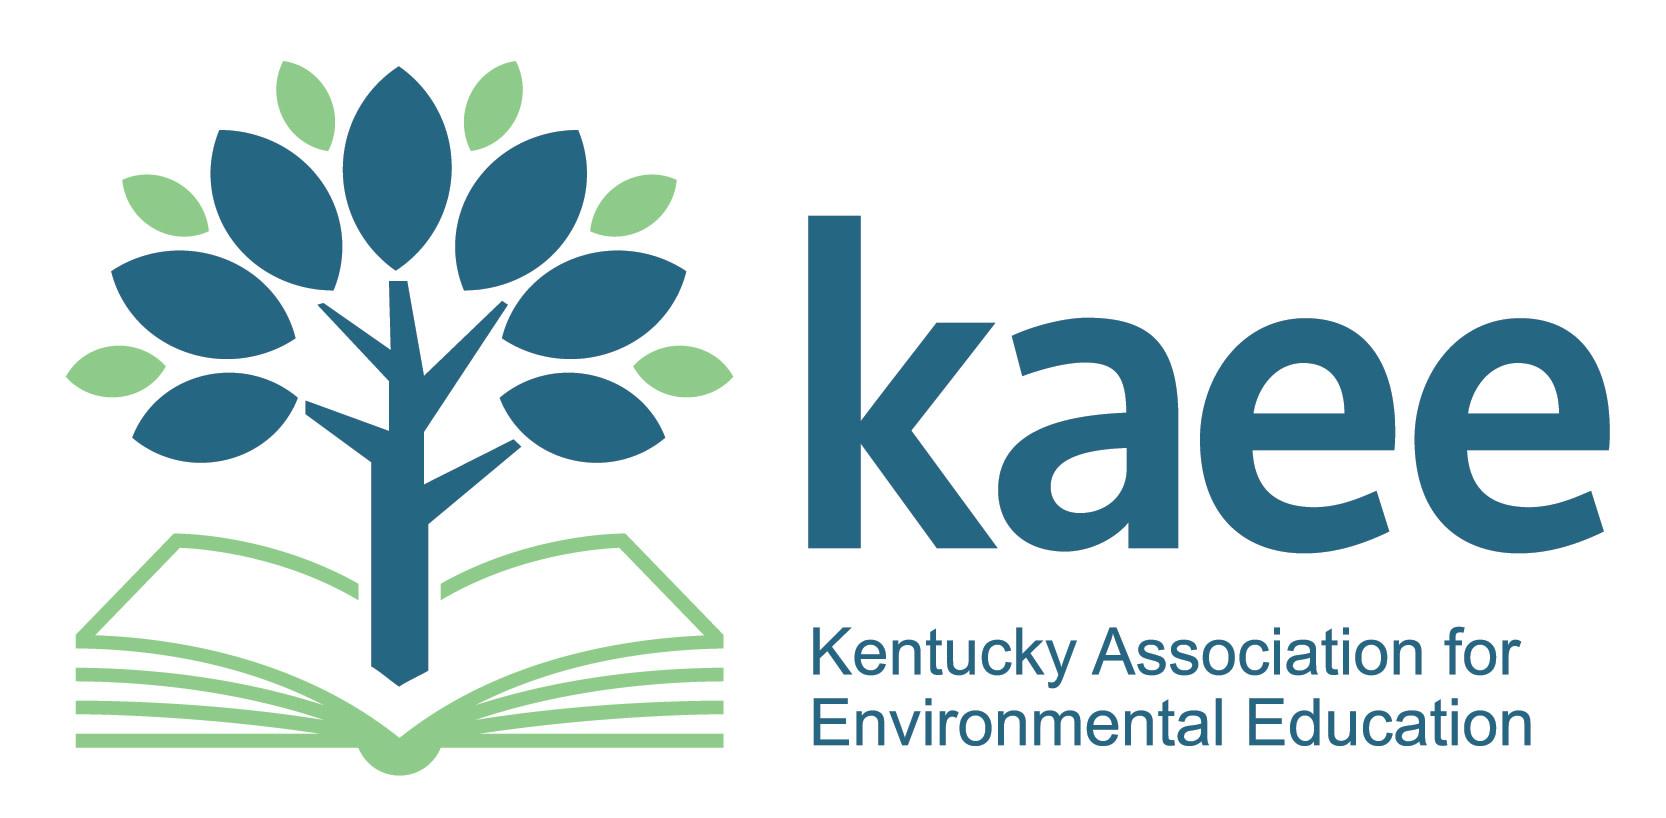 Kentucky Association for Environmental Education